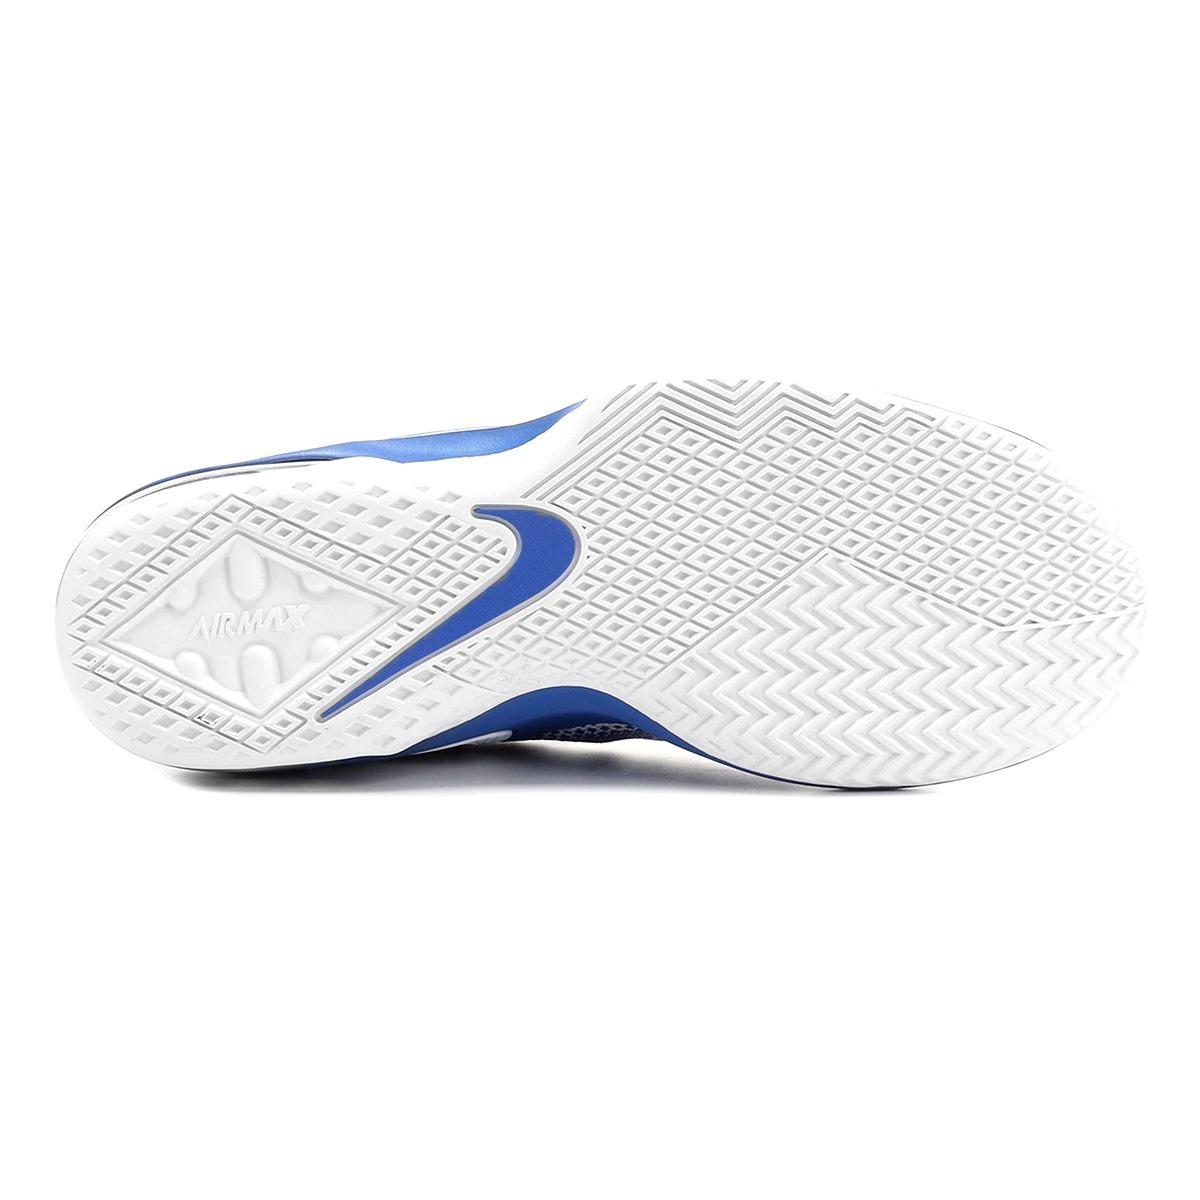 e42c2450d24 Carregando zoom... tênis nike air max infuriate low masculino - branco e  azul